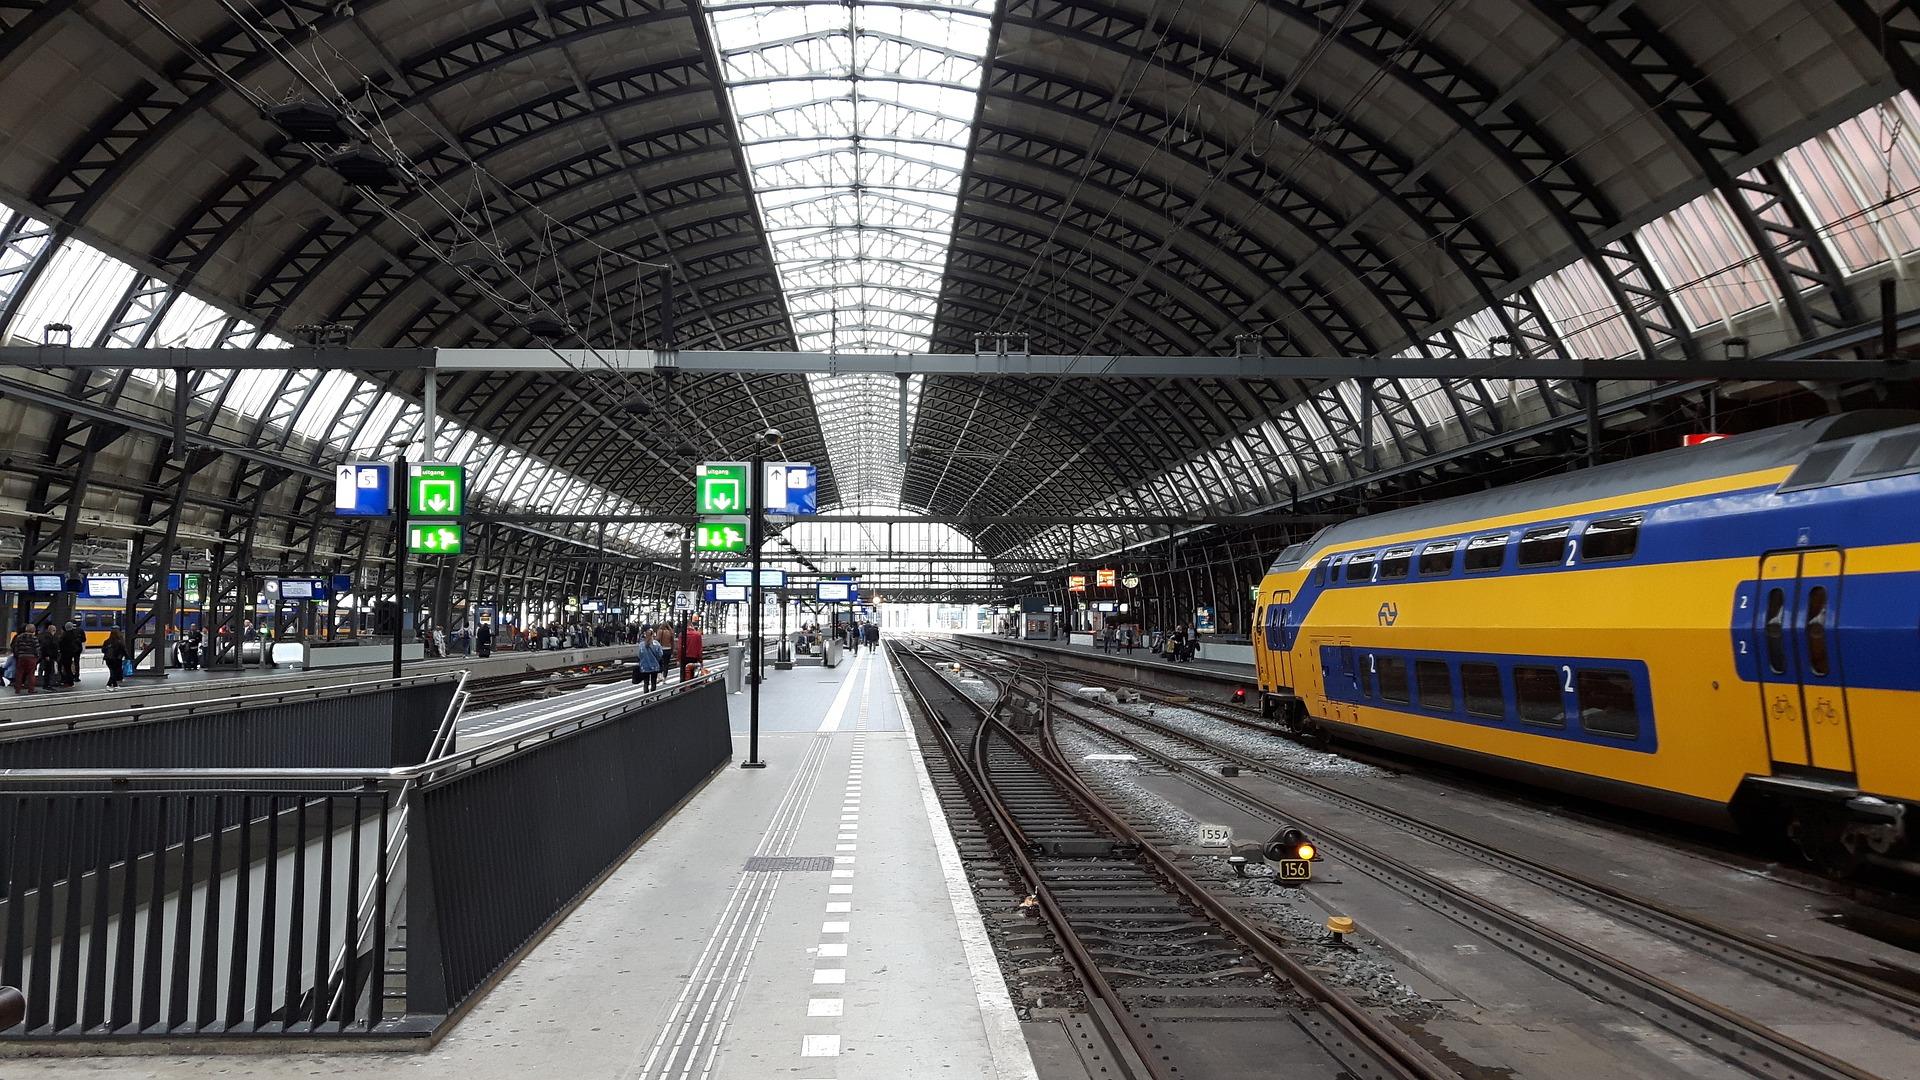 station-2740165_1920